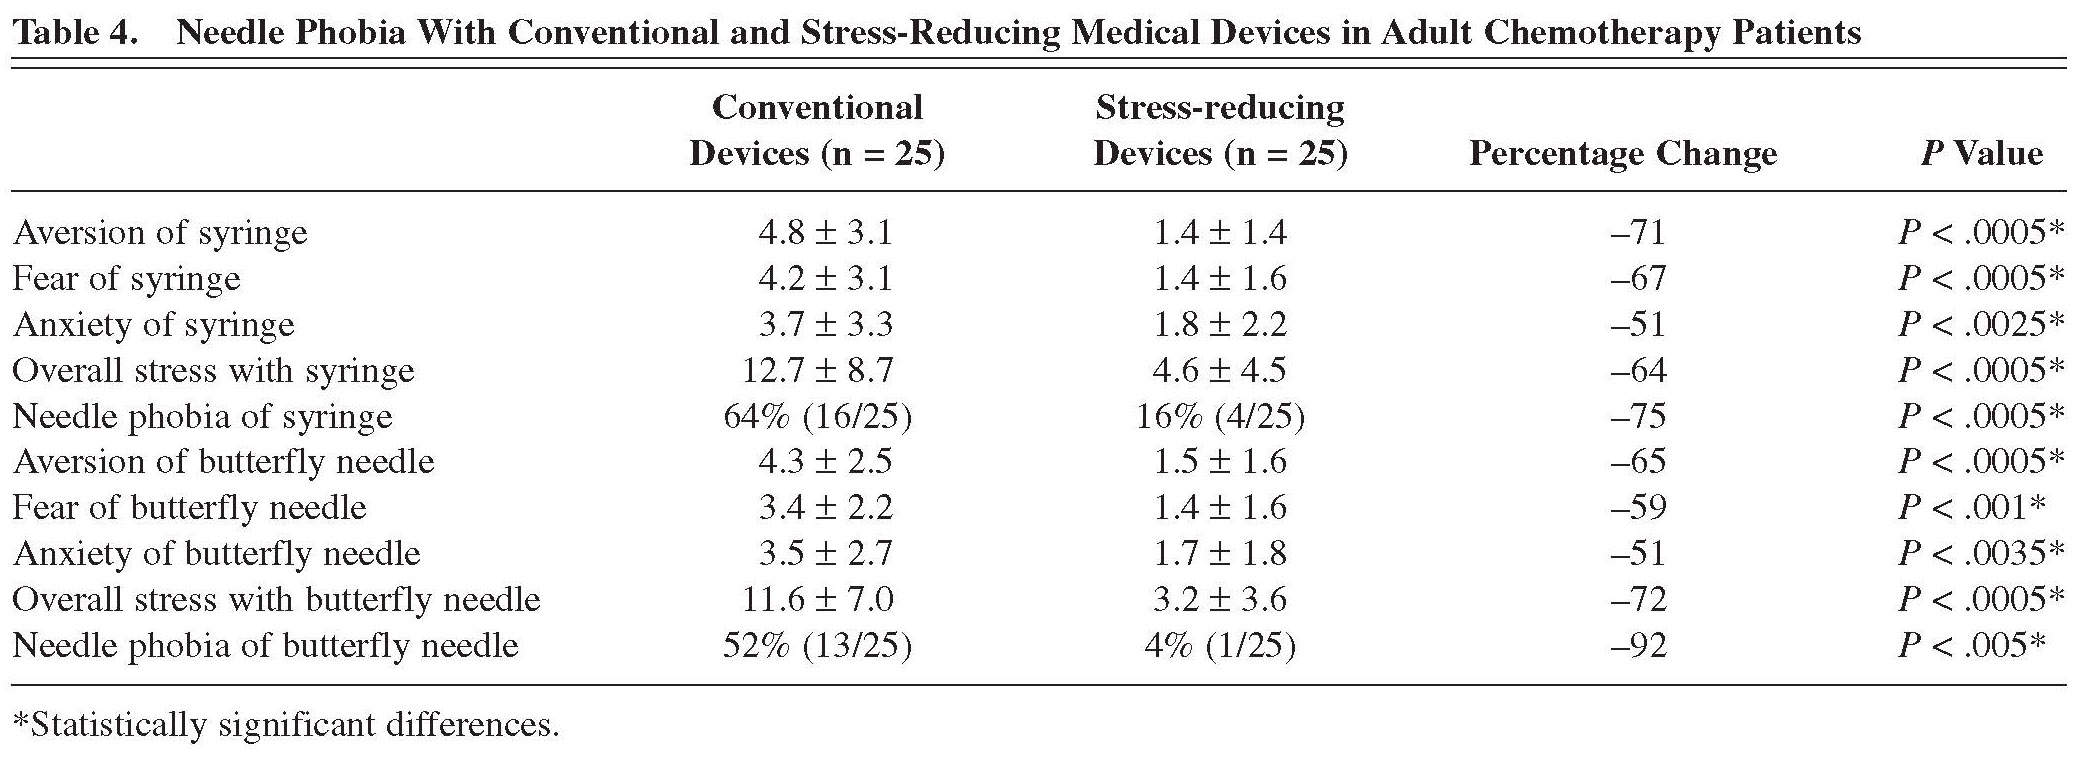 Academic OneFile - Document - Needle phobia and stress